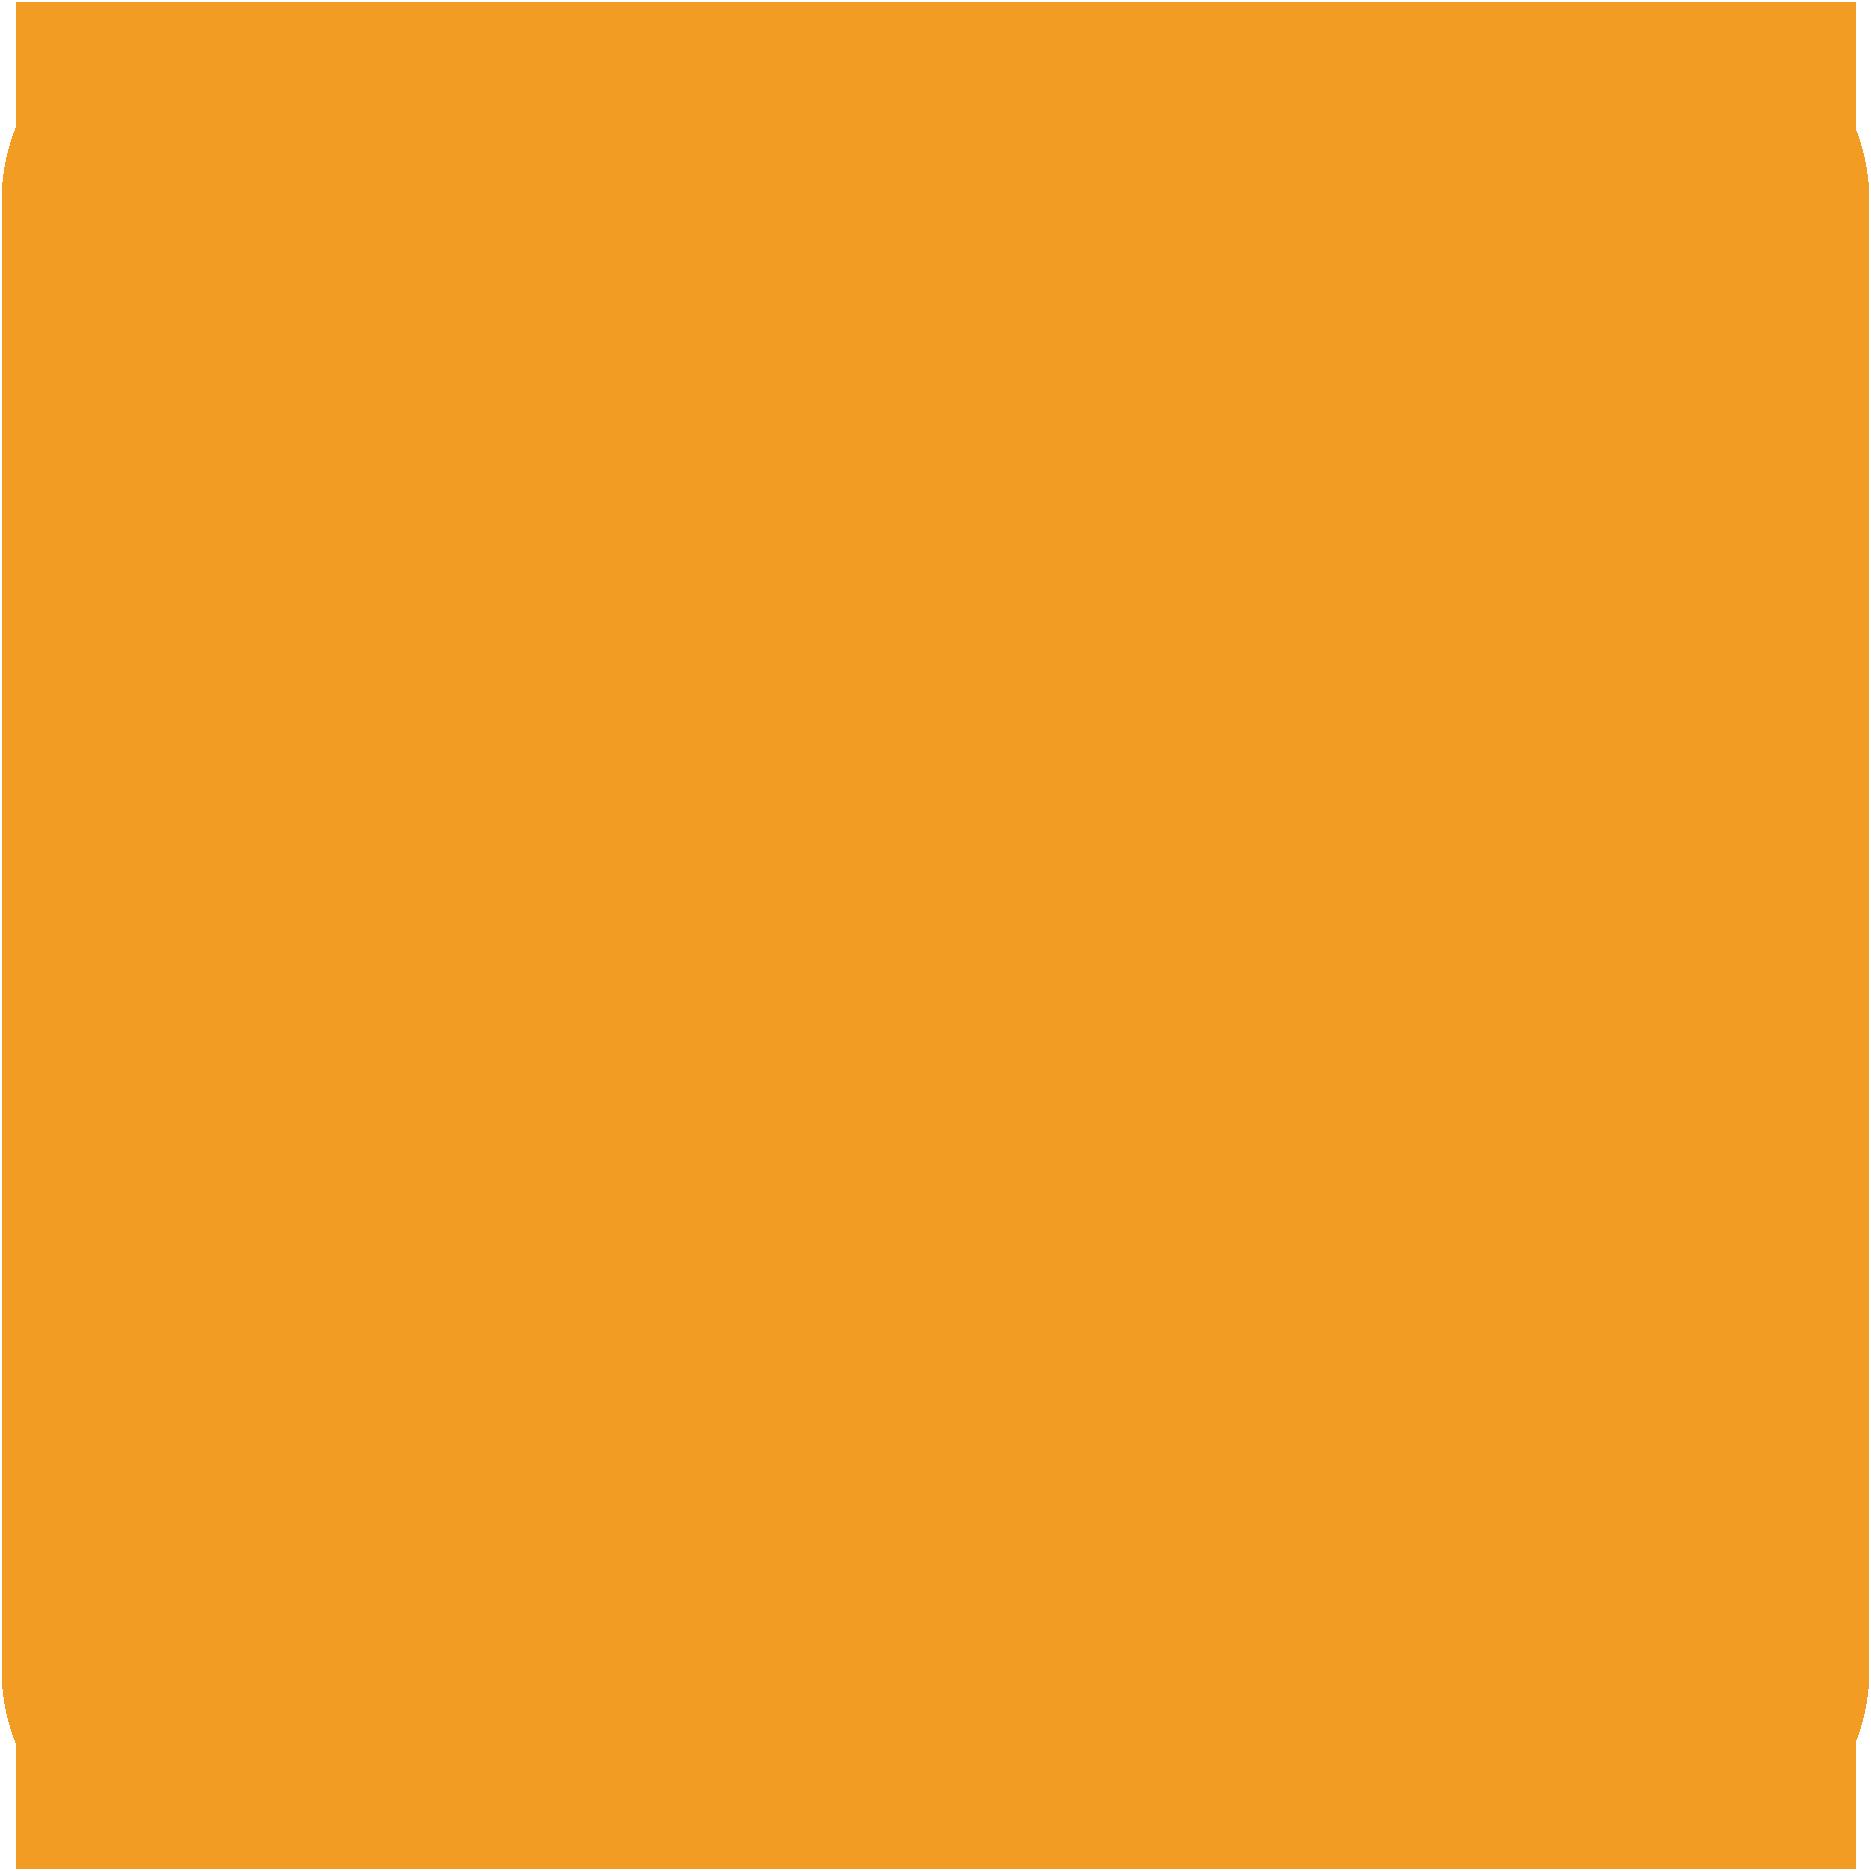 Twitter StoriiCare